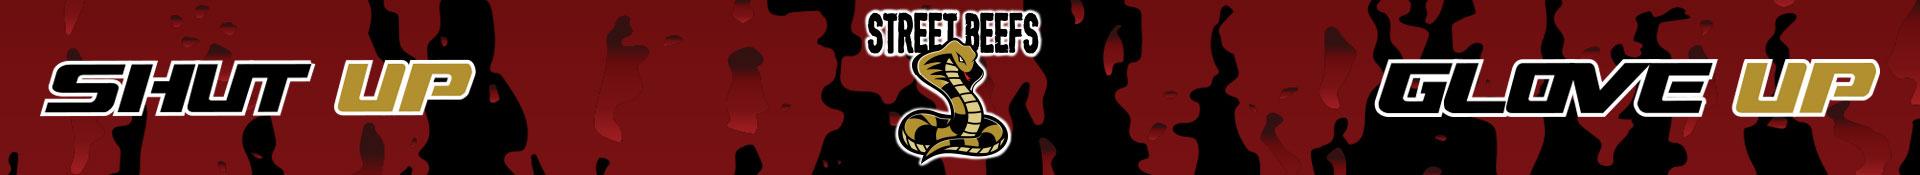 StreetBeefs Merch and Gear